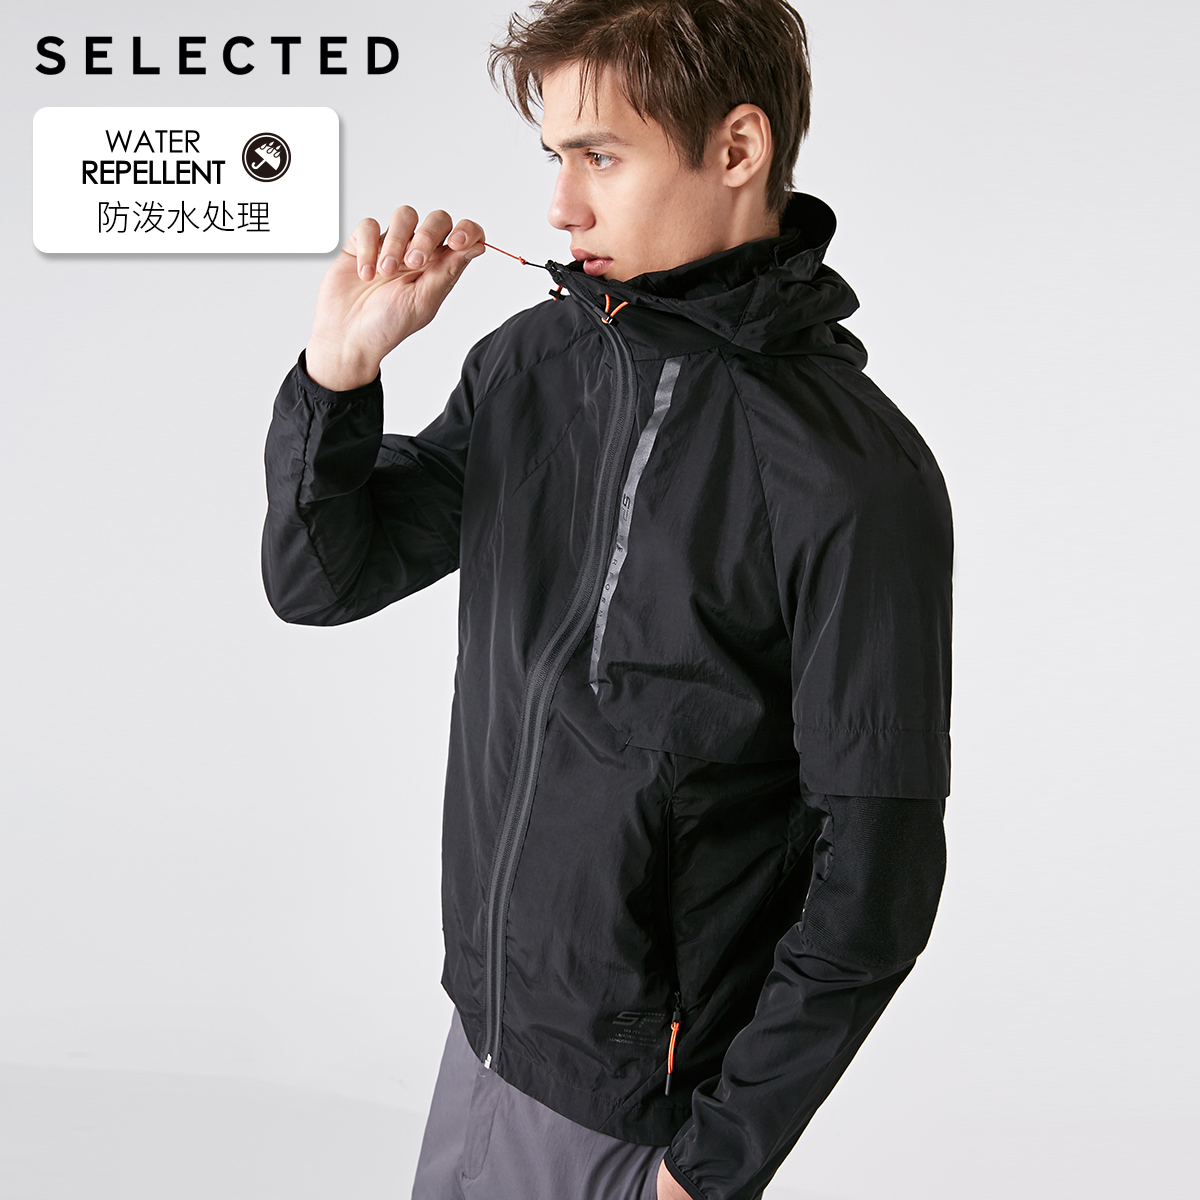 SELECTED Men's Spring Hooded Waterproof Lightweight Casual Jacket S 419121524